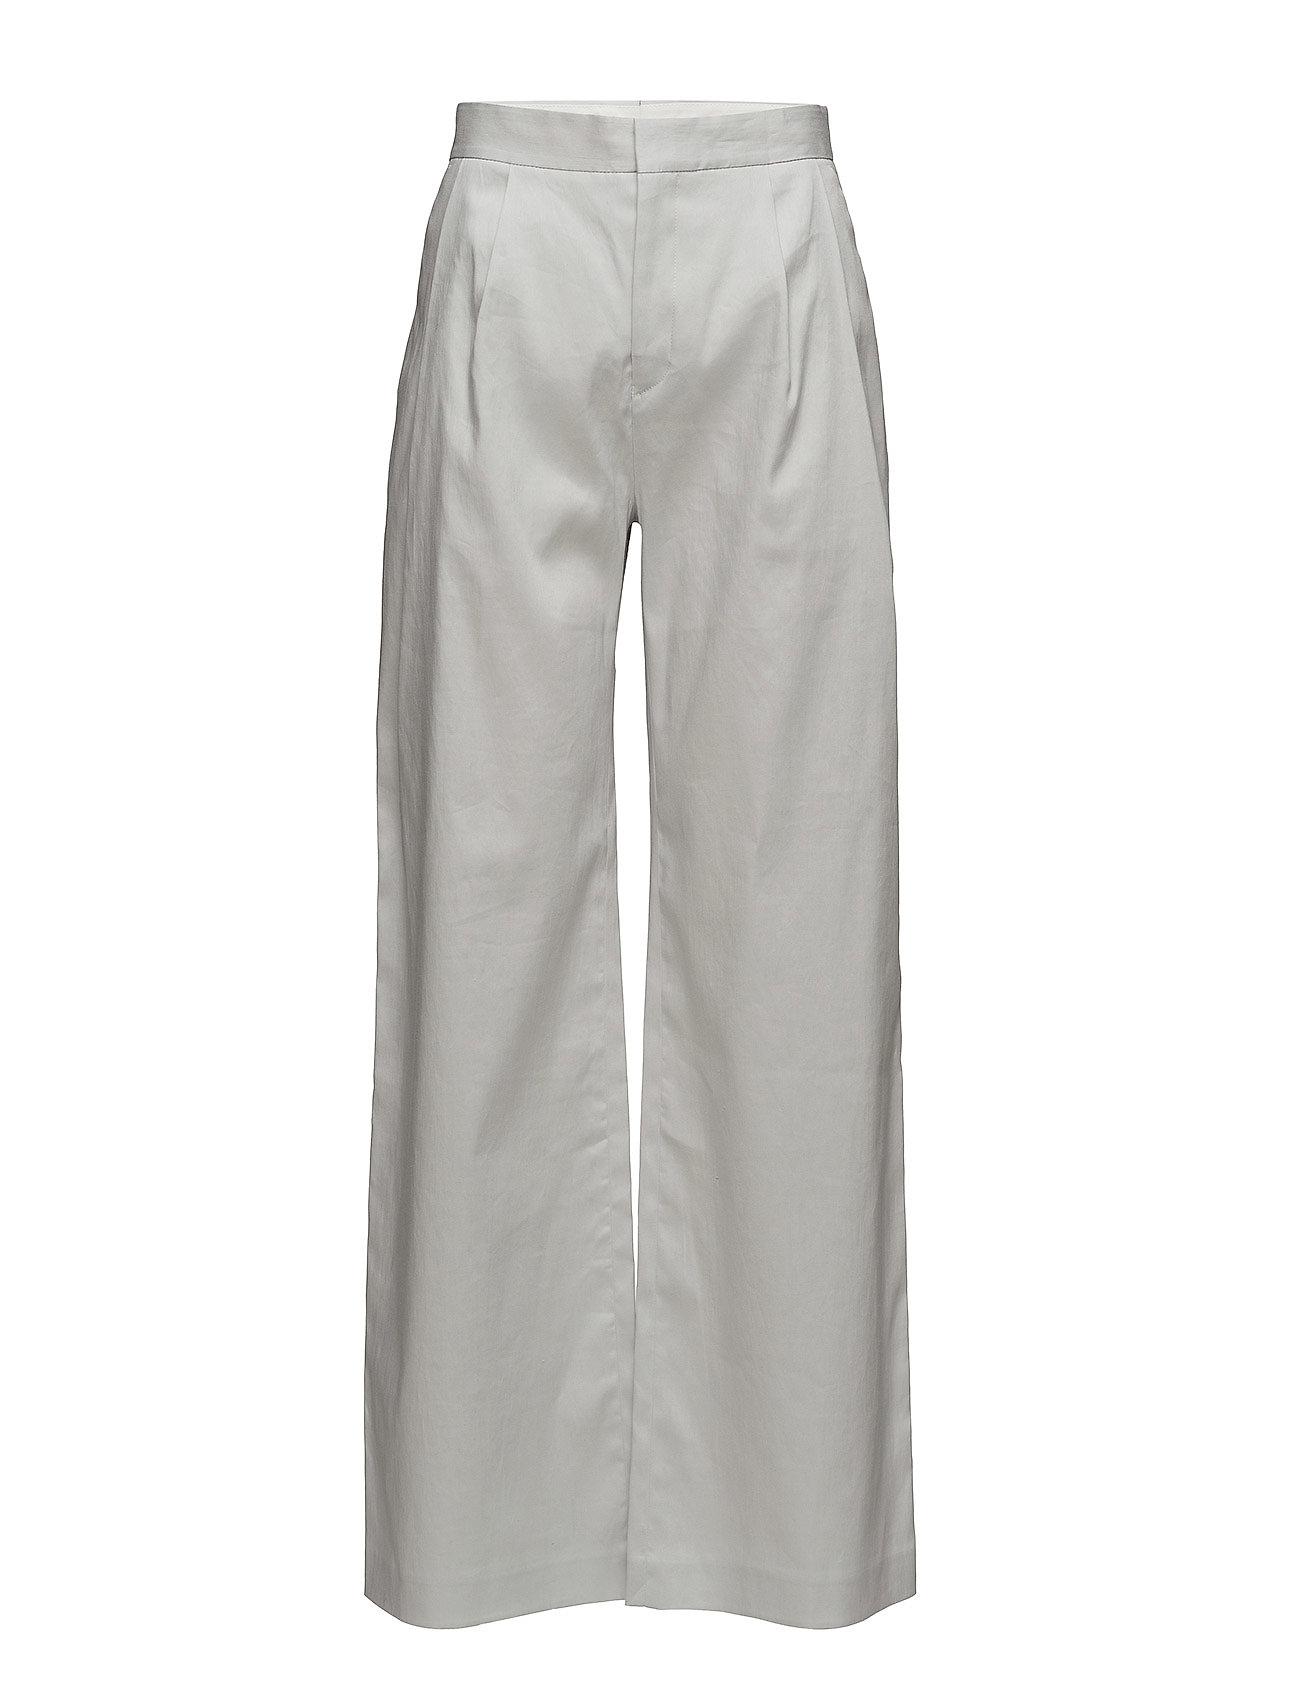 Image of Katie Pleated Trousers Vide Bukser Grå Filippa K (3430201971)